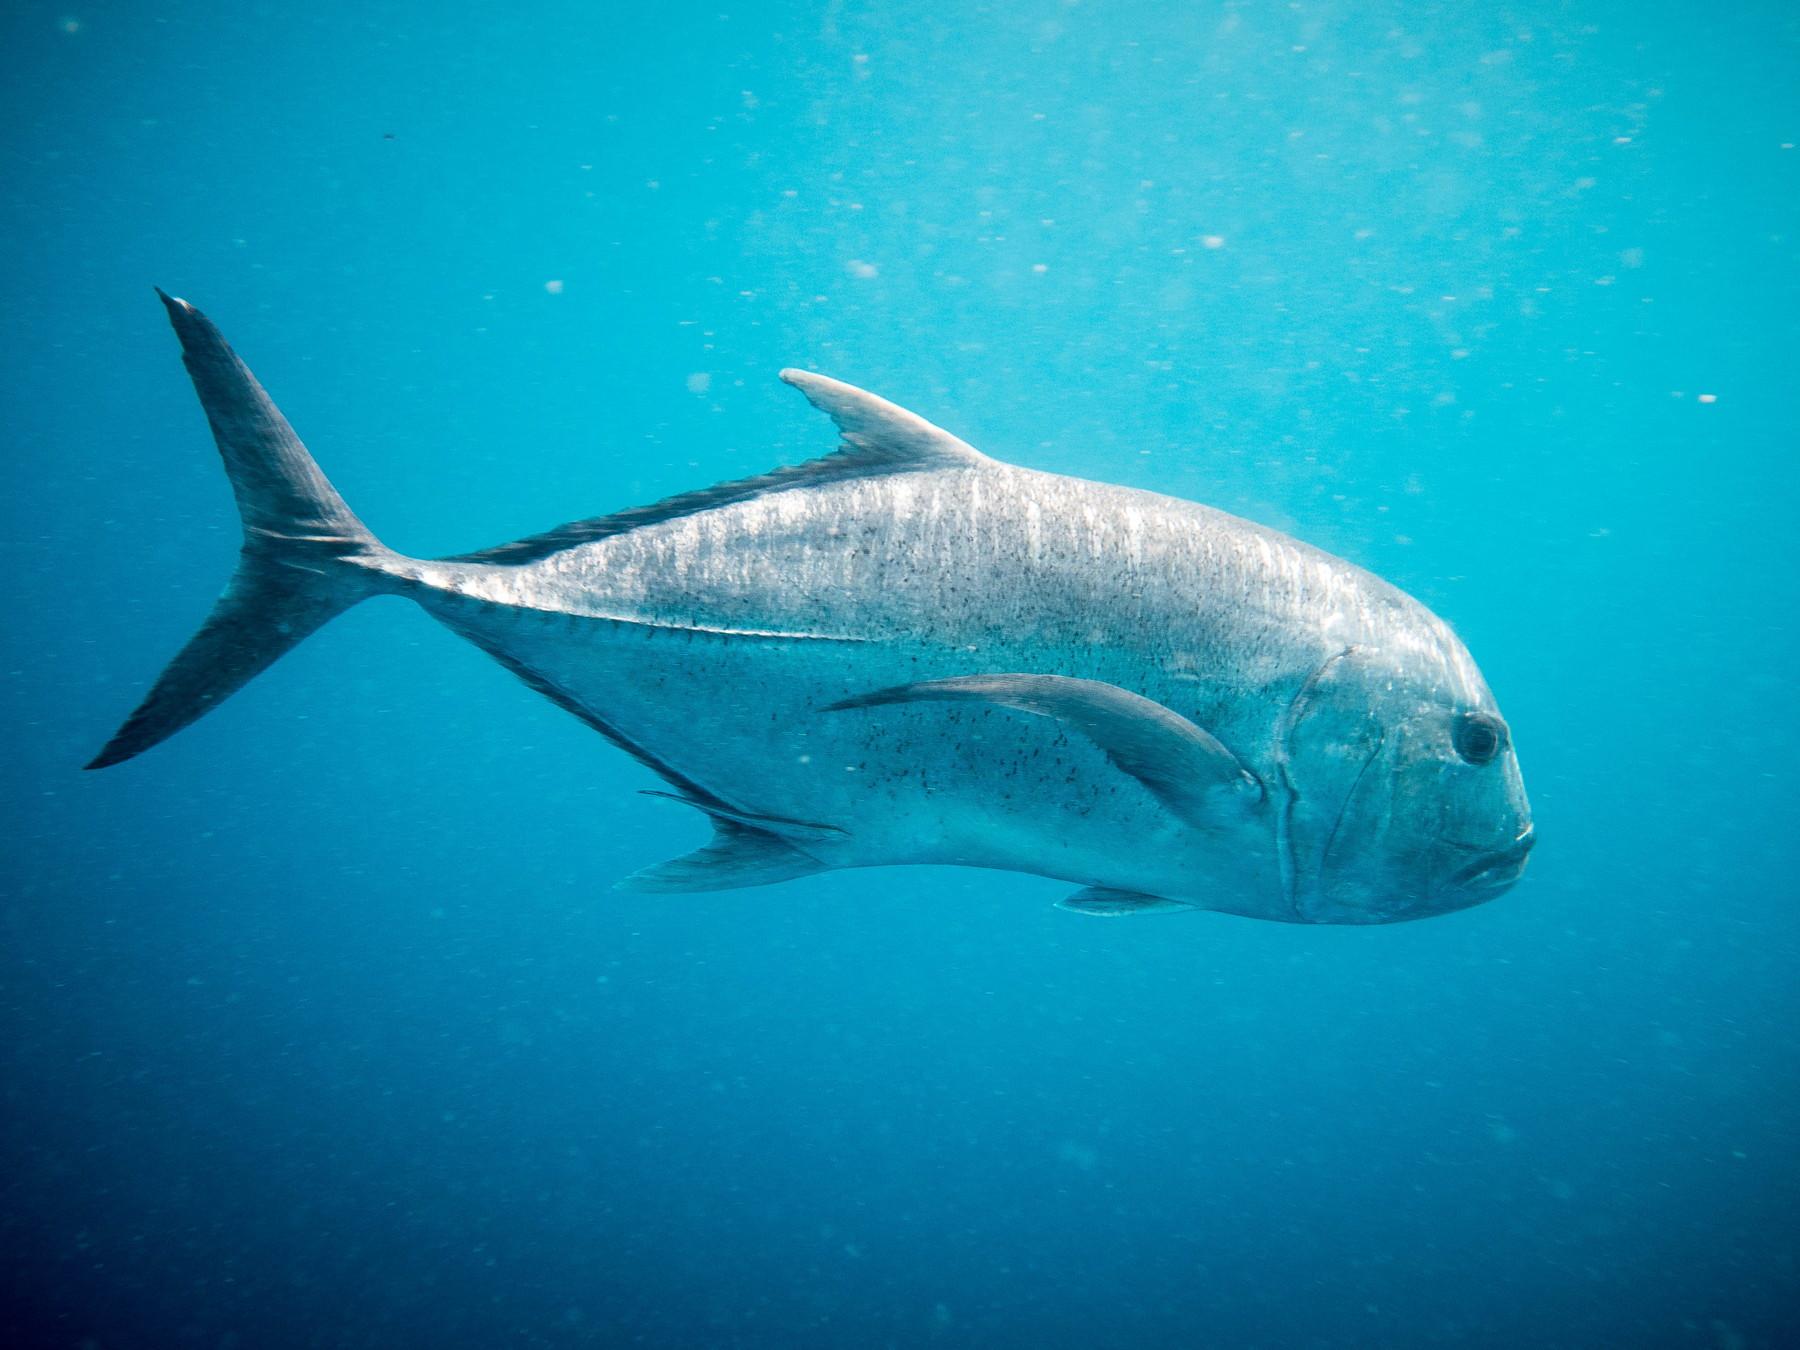 Diving @ S.S. Yongala